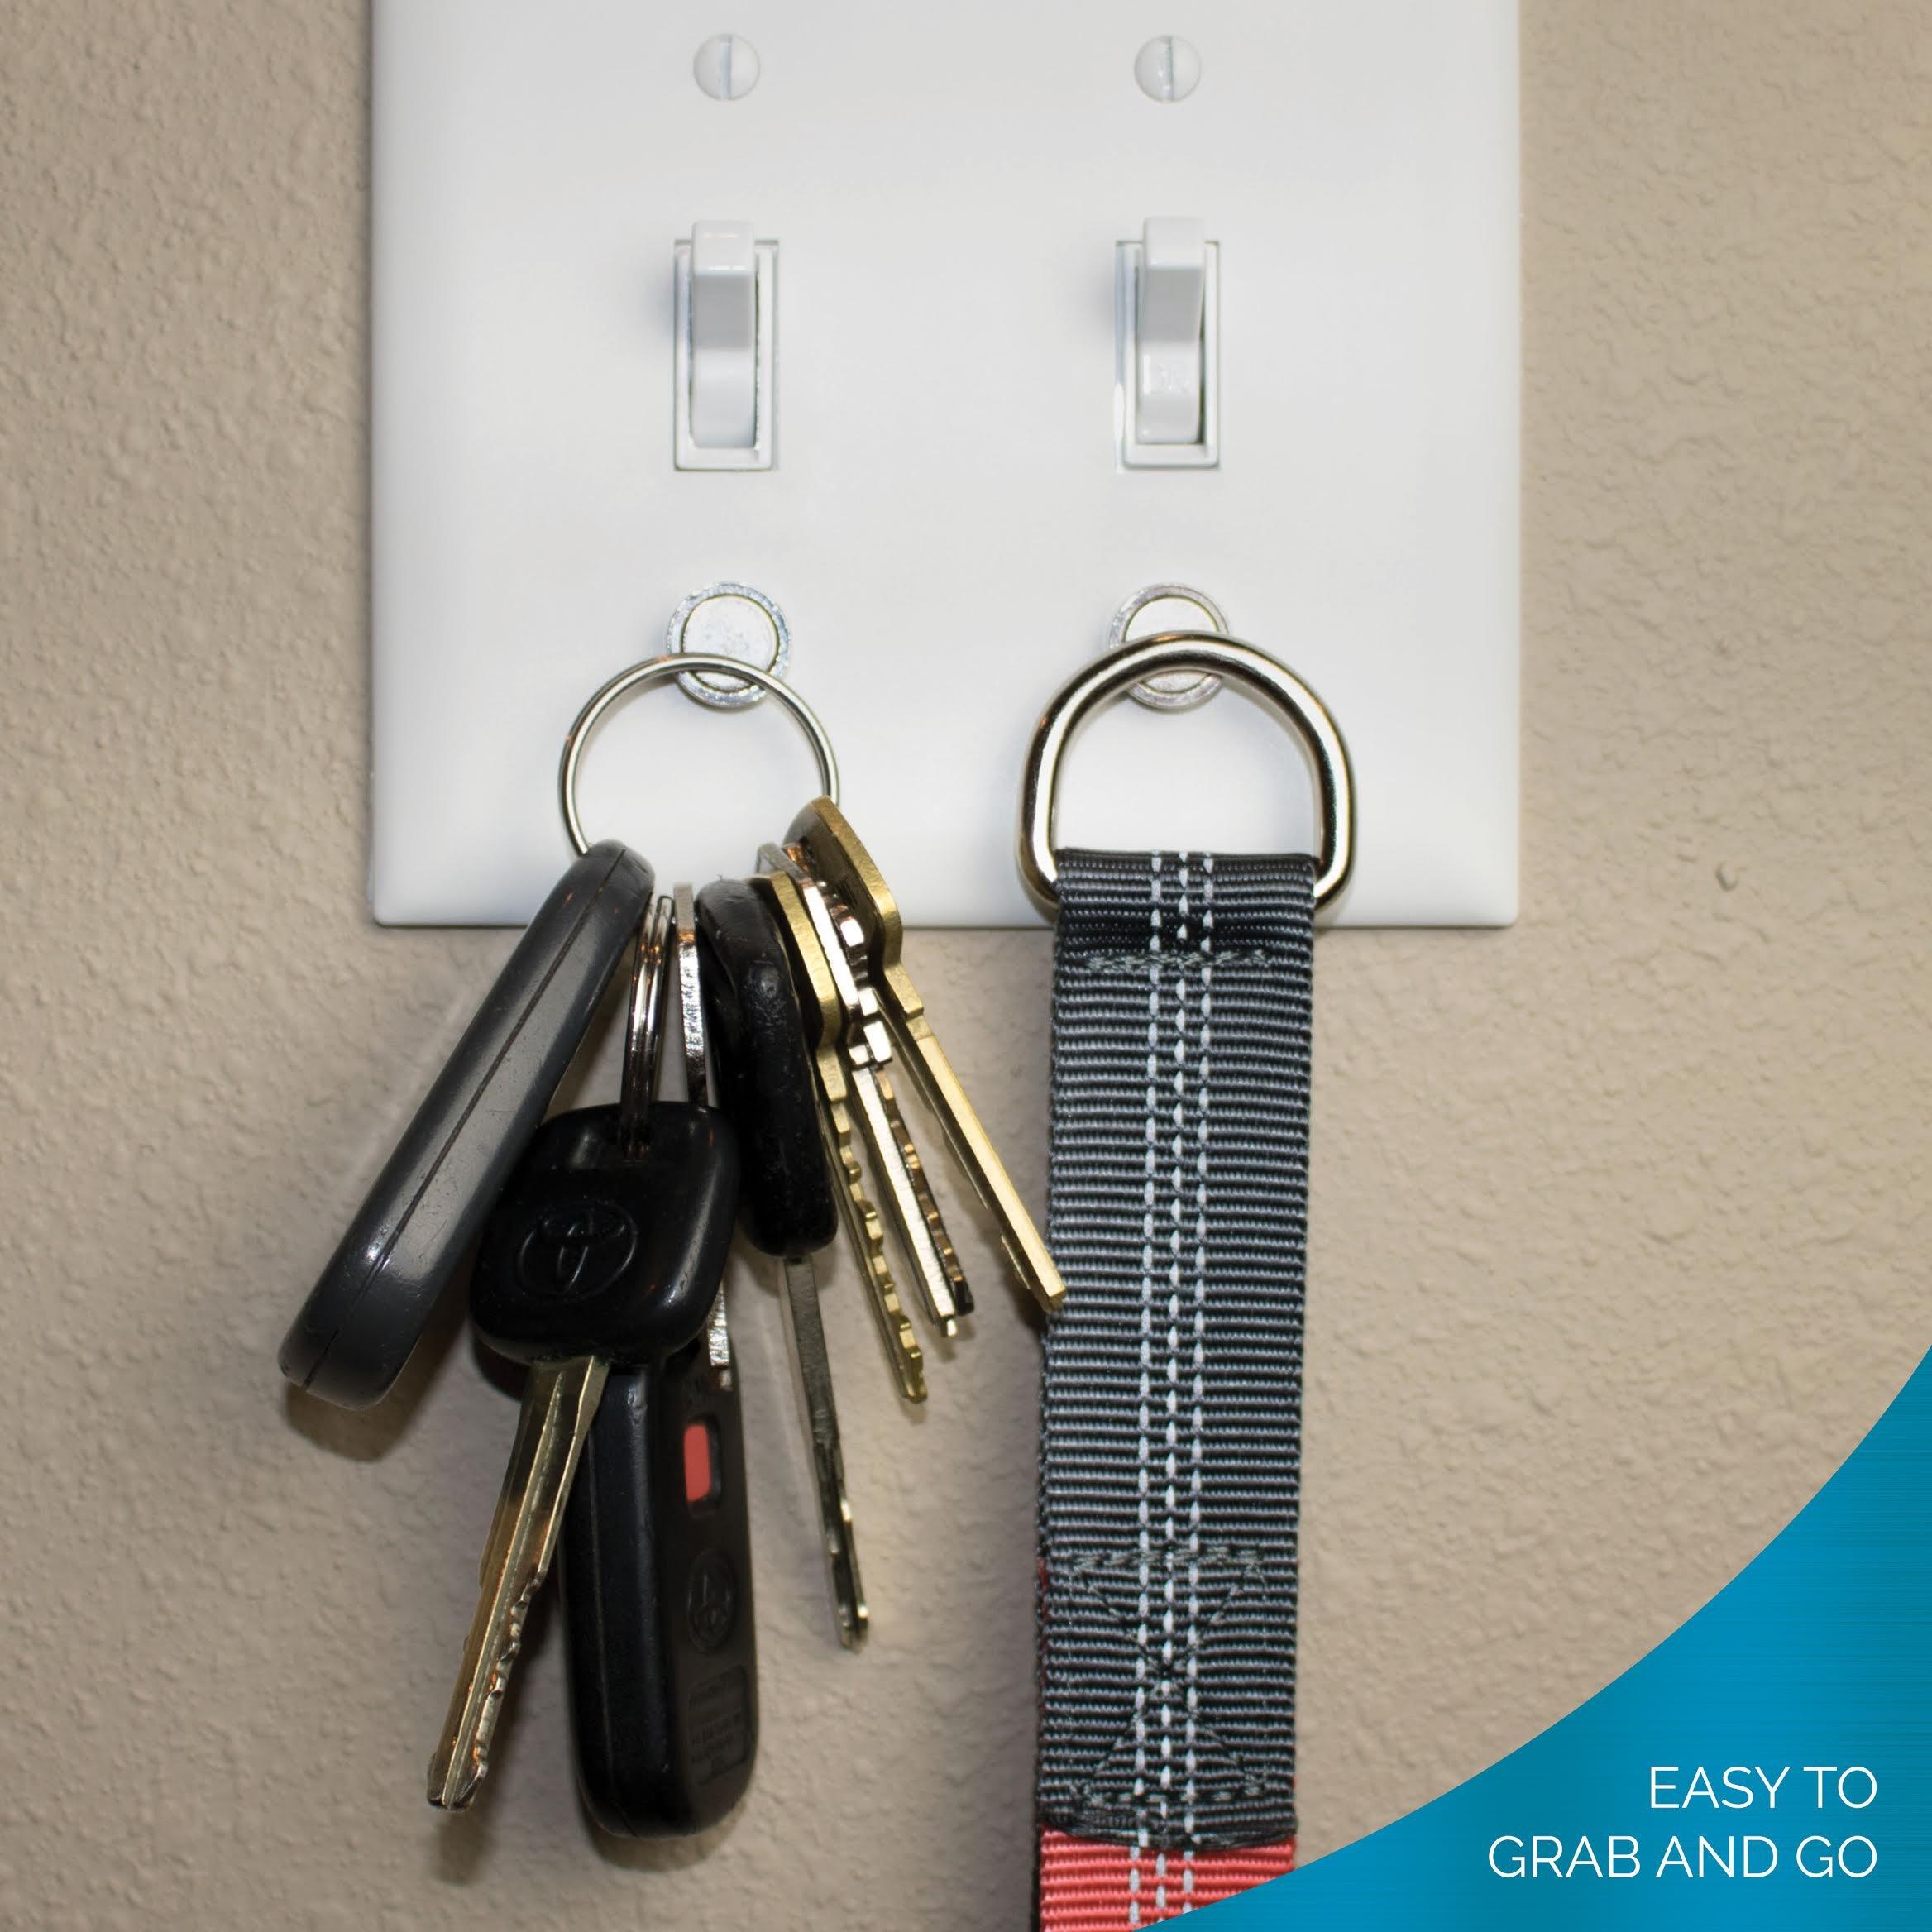 Magnetic Key Rack by Savvy Home | Key Holder for Light Switch | Smart Modern Design for Keychain Rings, Car Keys, Key FOBs | Easy Installation (4 Pack)